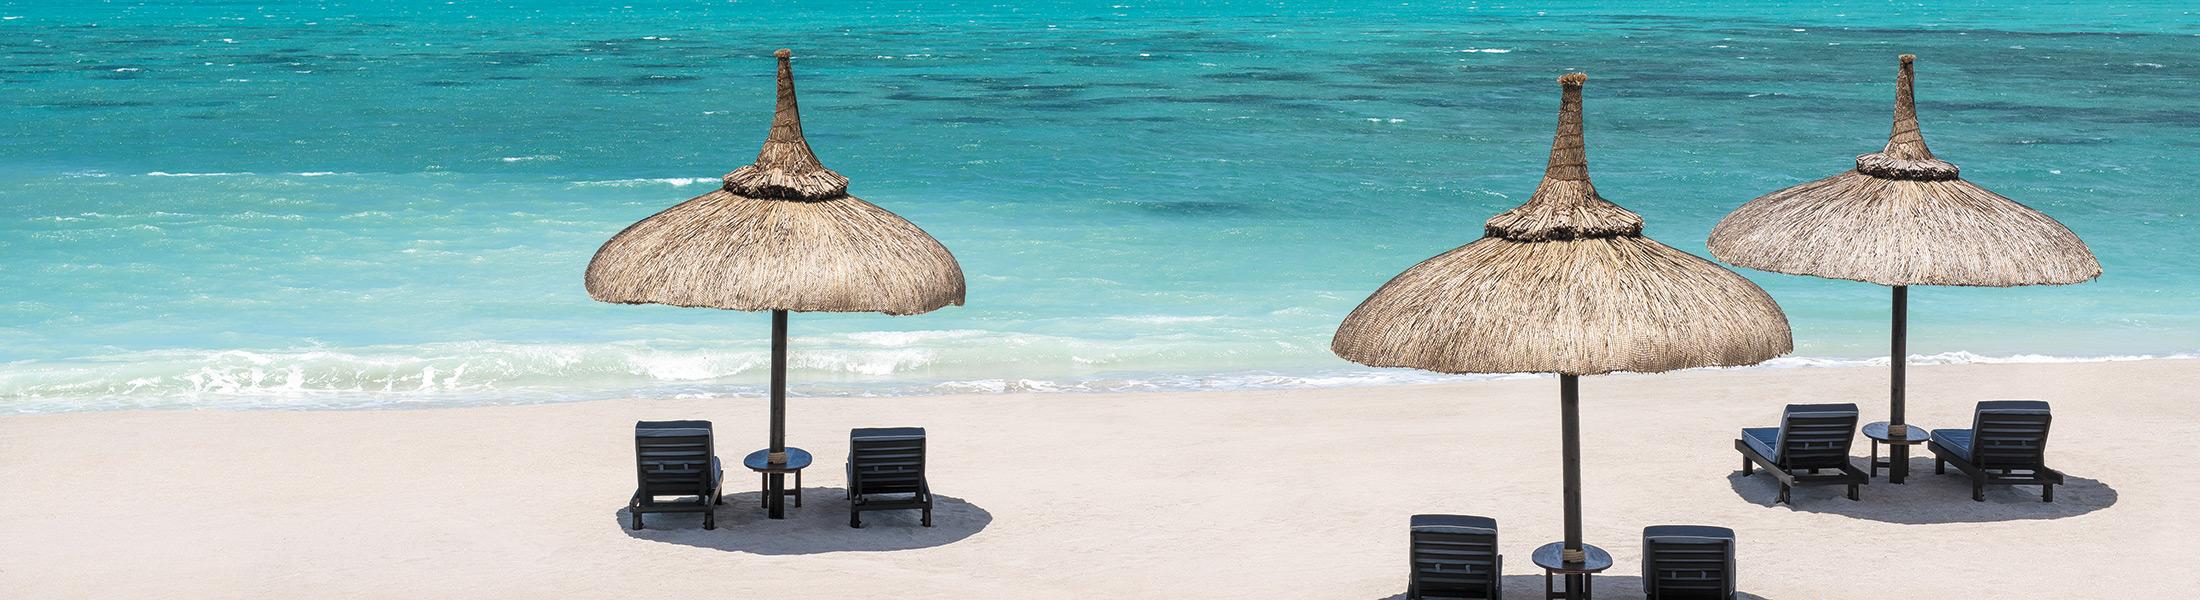 Sun lounges and umbrellas on the beach at Shangri-La's Le Touessrok Mauritius